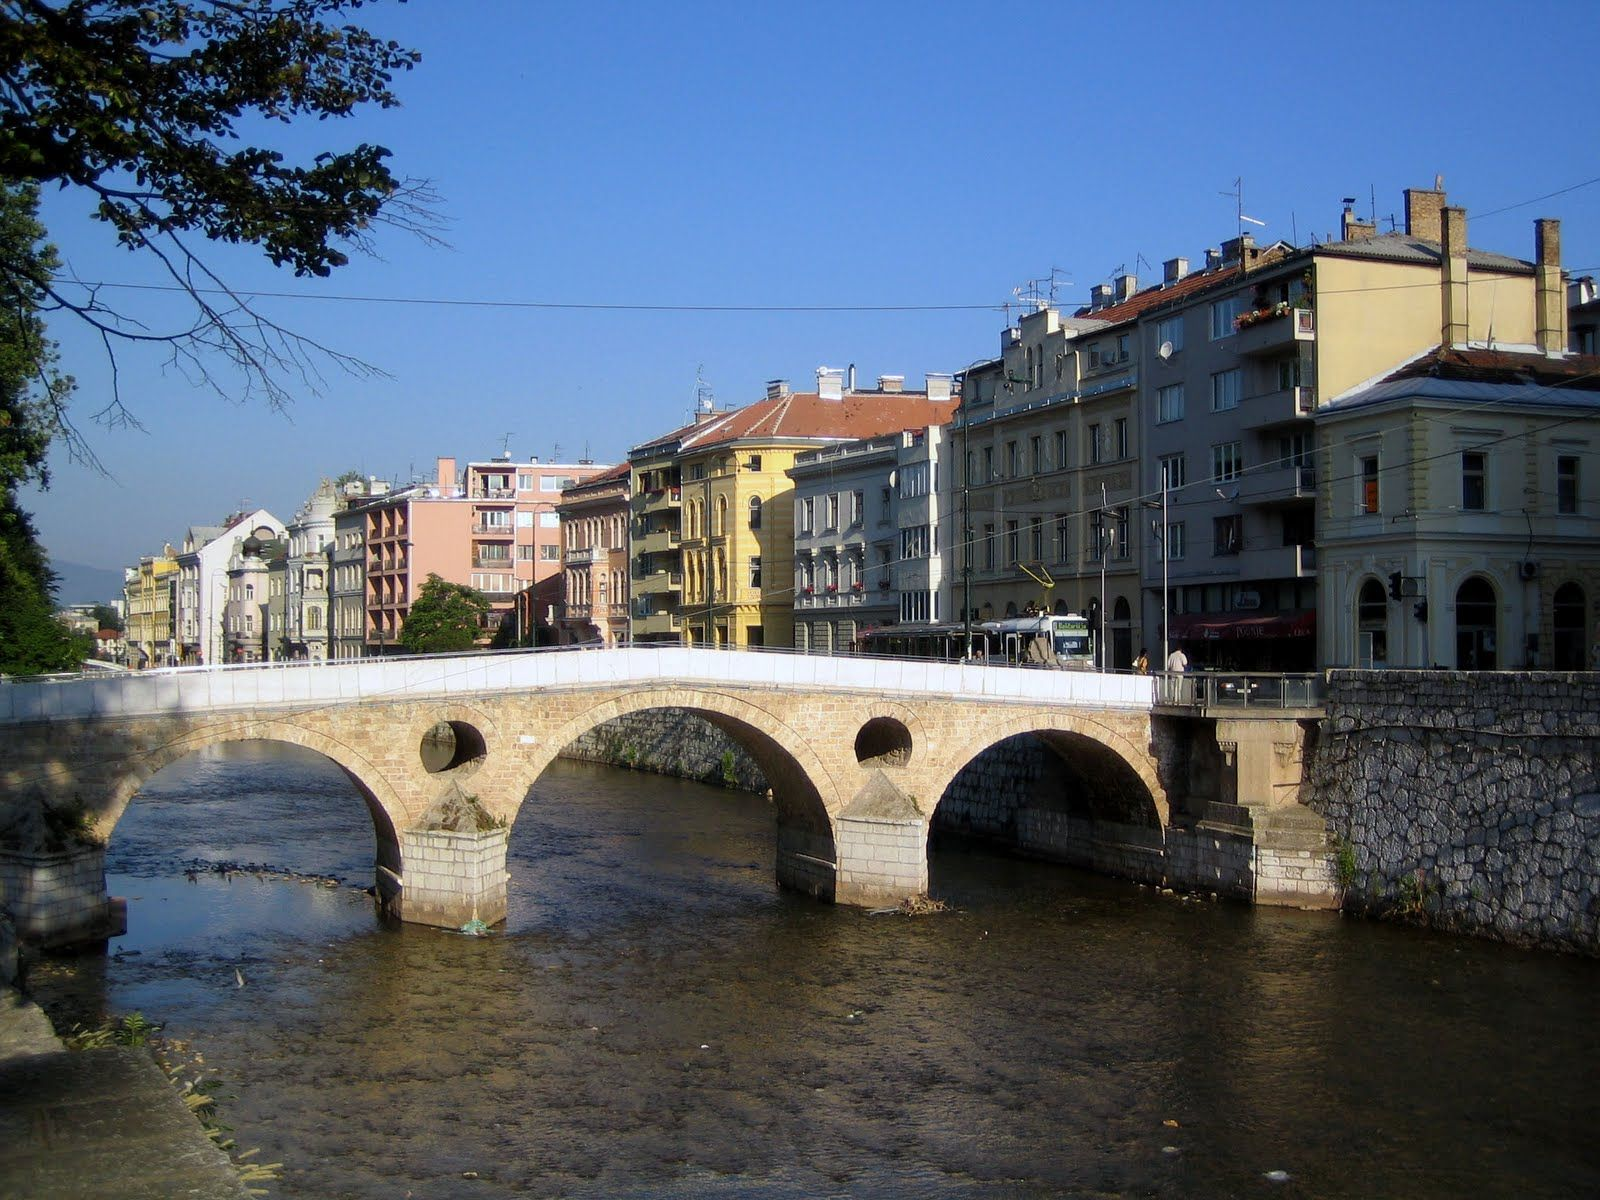 Sarajevo Bosnialatin Bridge Where The Archduke Franz